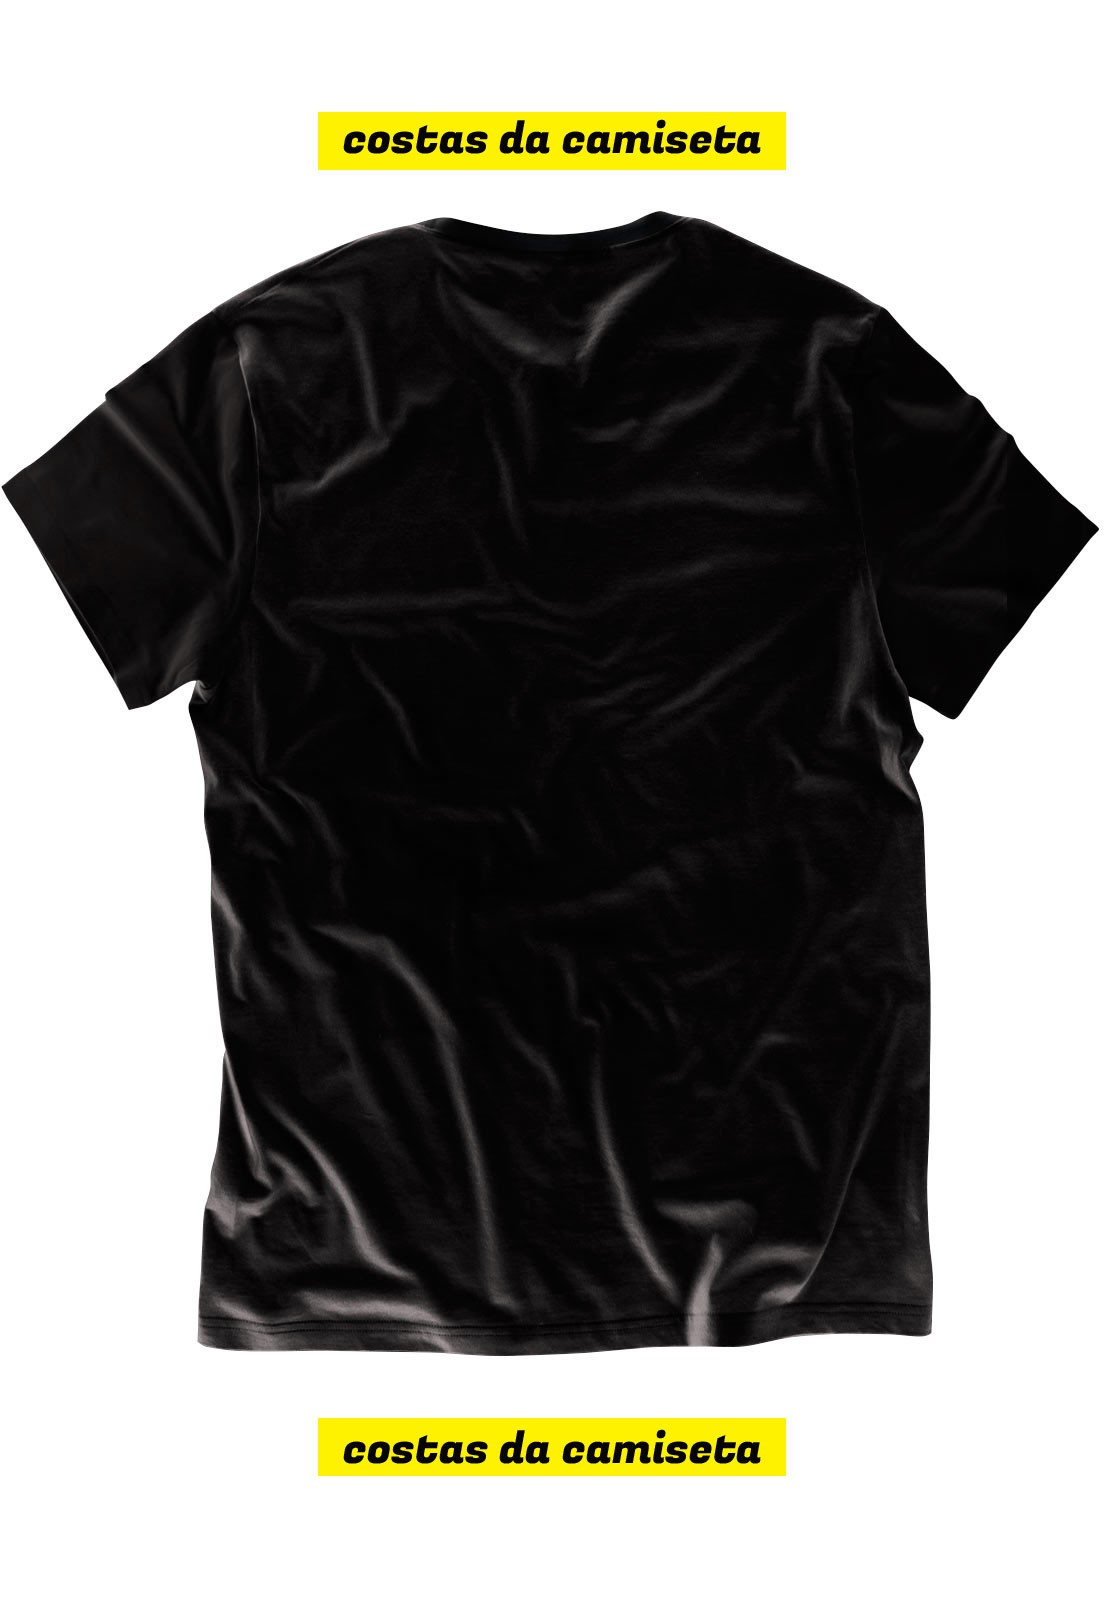 Camiseta Caveira Mexicana Floral Skull Tshirt Camisa Swag